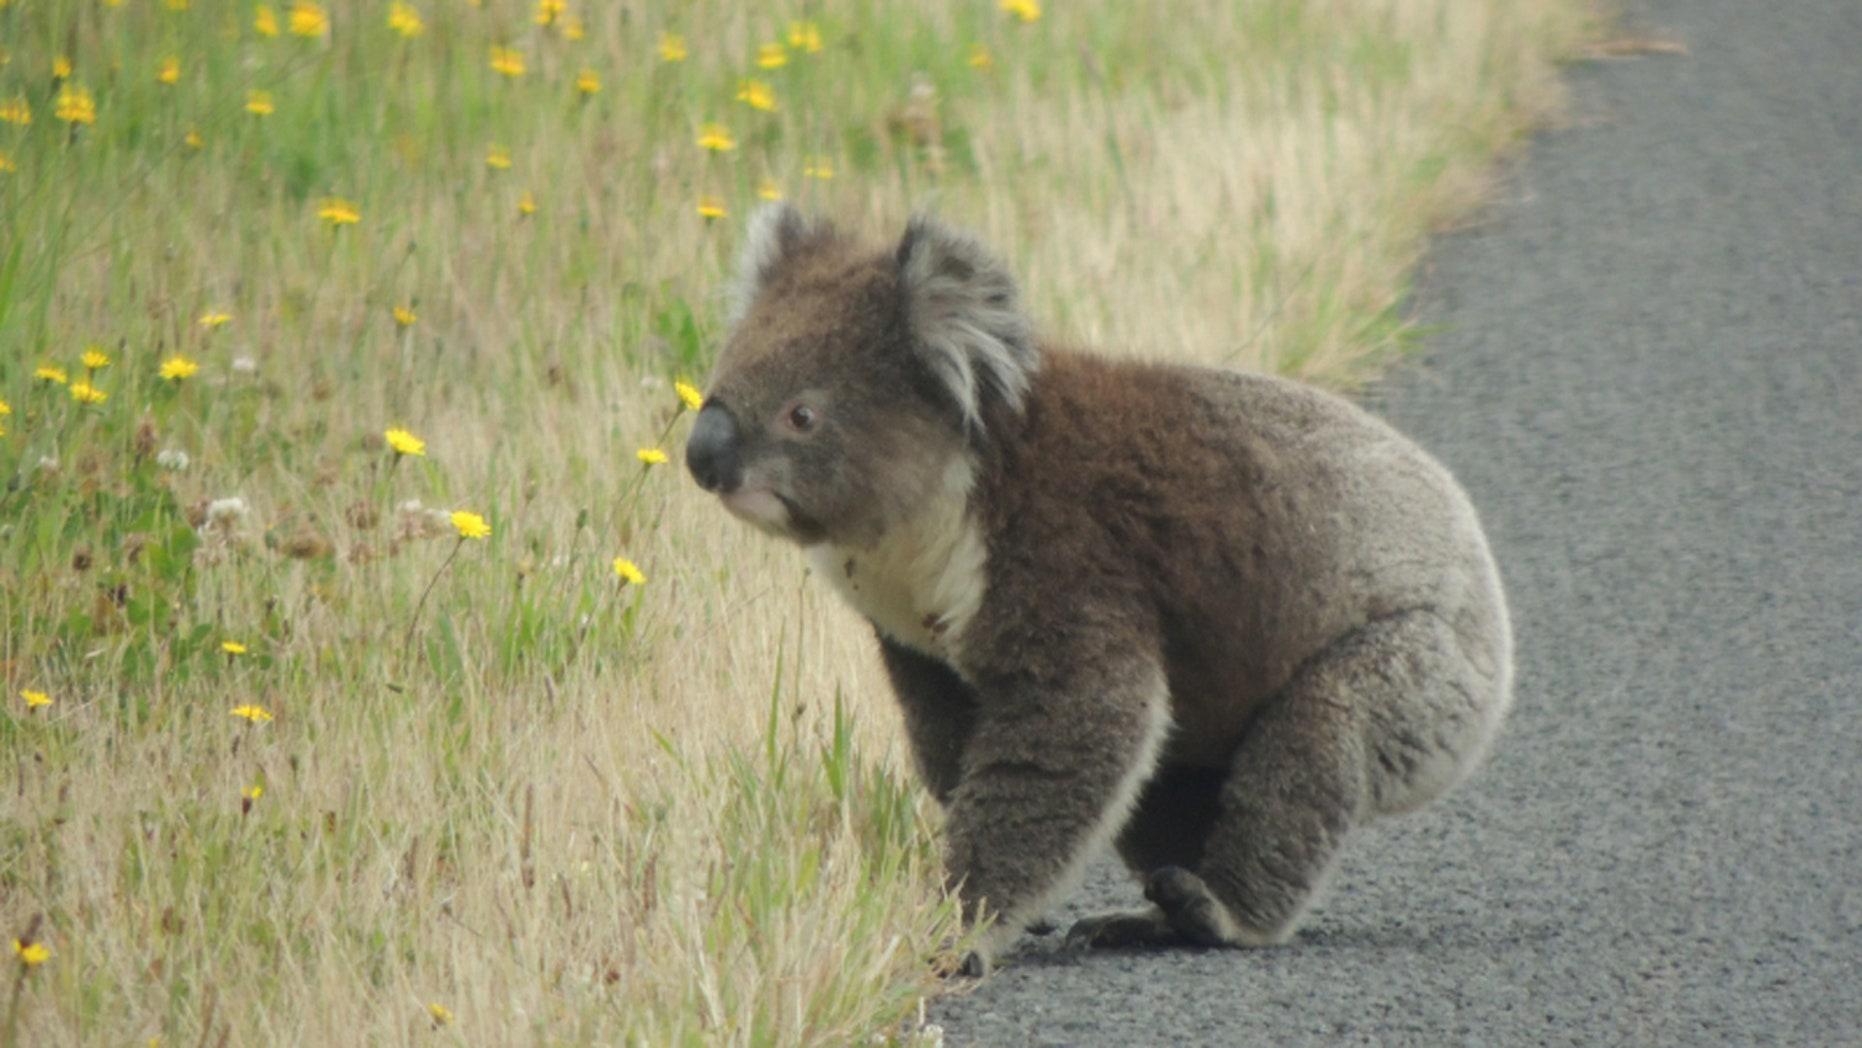 Why did the koala cross the road?